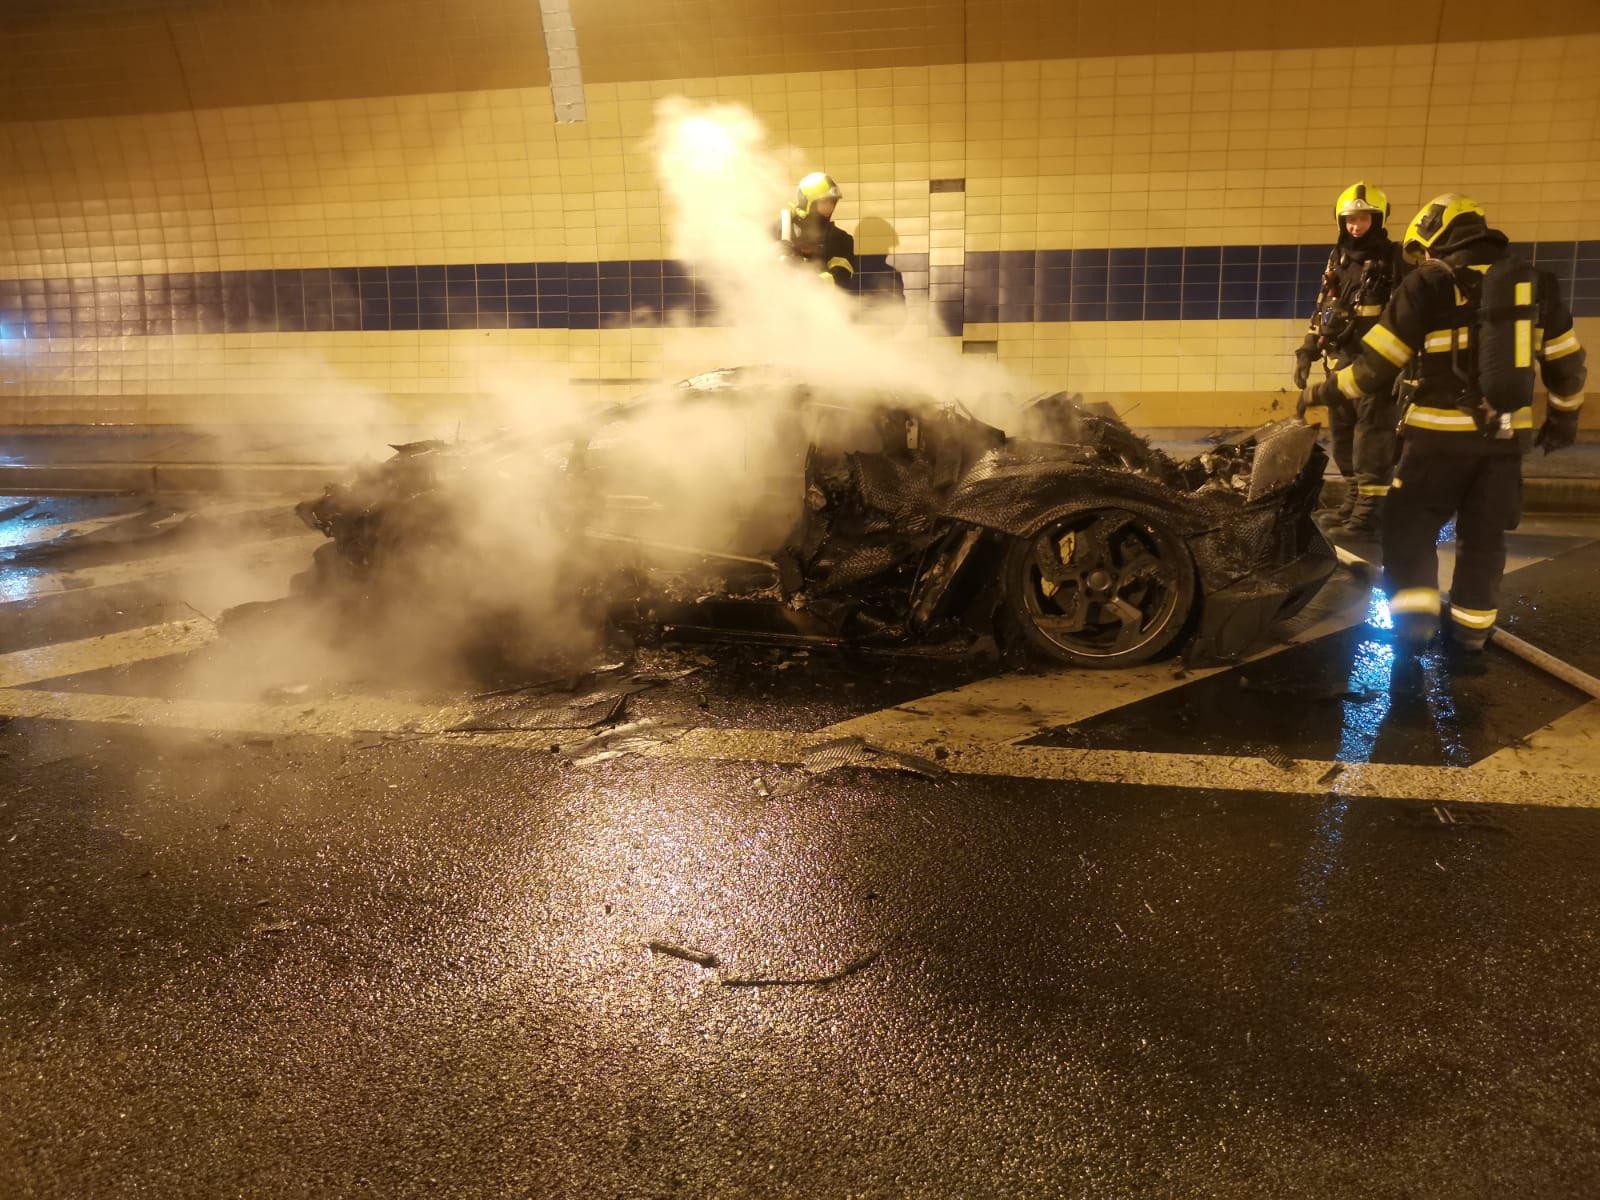 Lamborghini-Aventador-Carbonado-burned-7